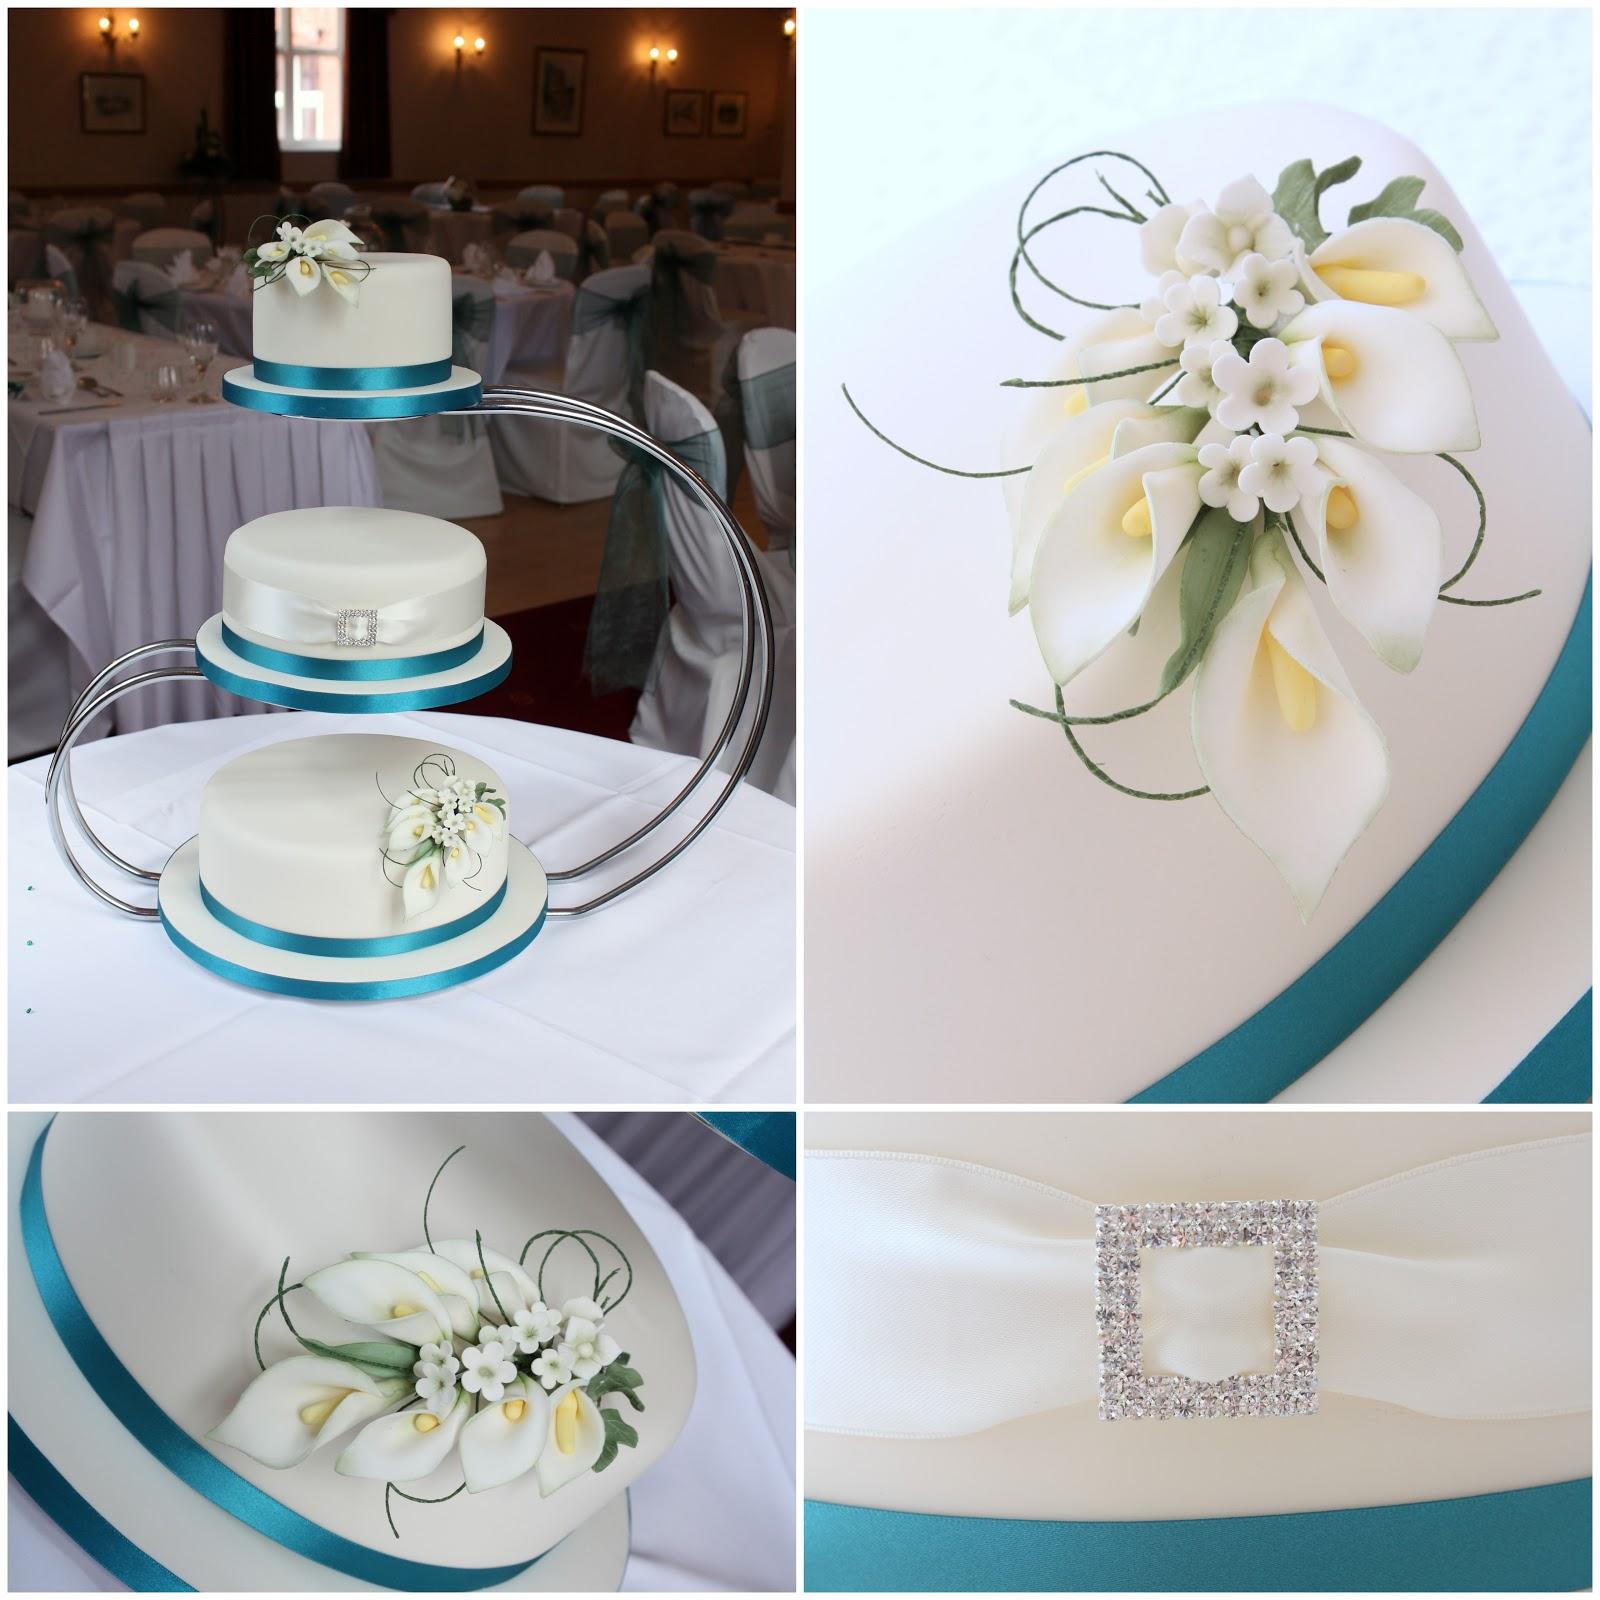 Tiers Tiaras Calla Lily Wedding Cake - Calla Lilly Wedding Cake